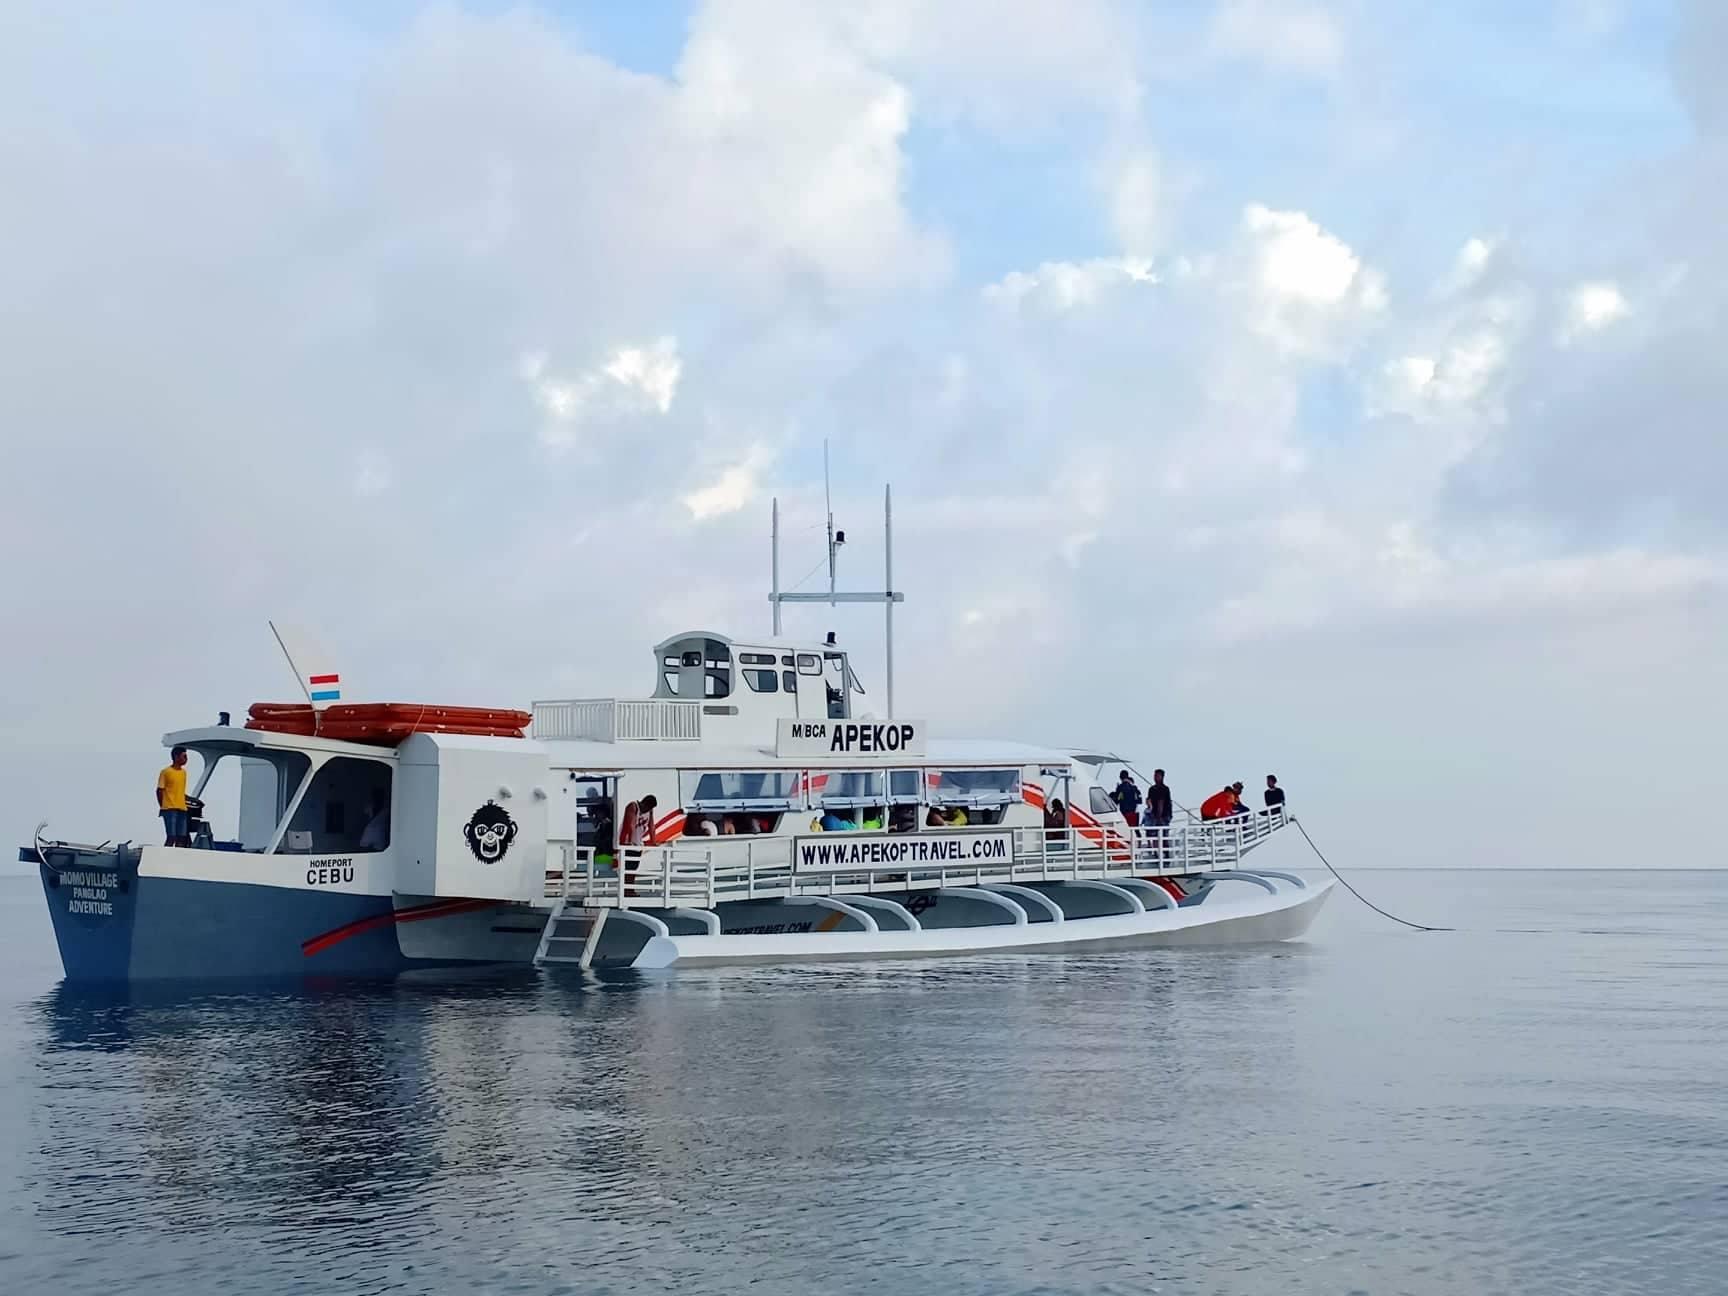 Bohol Island to Oslob Shared Transfer